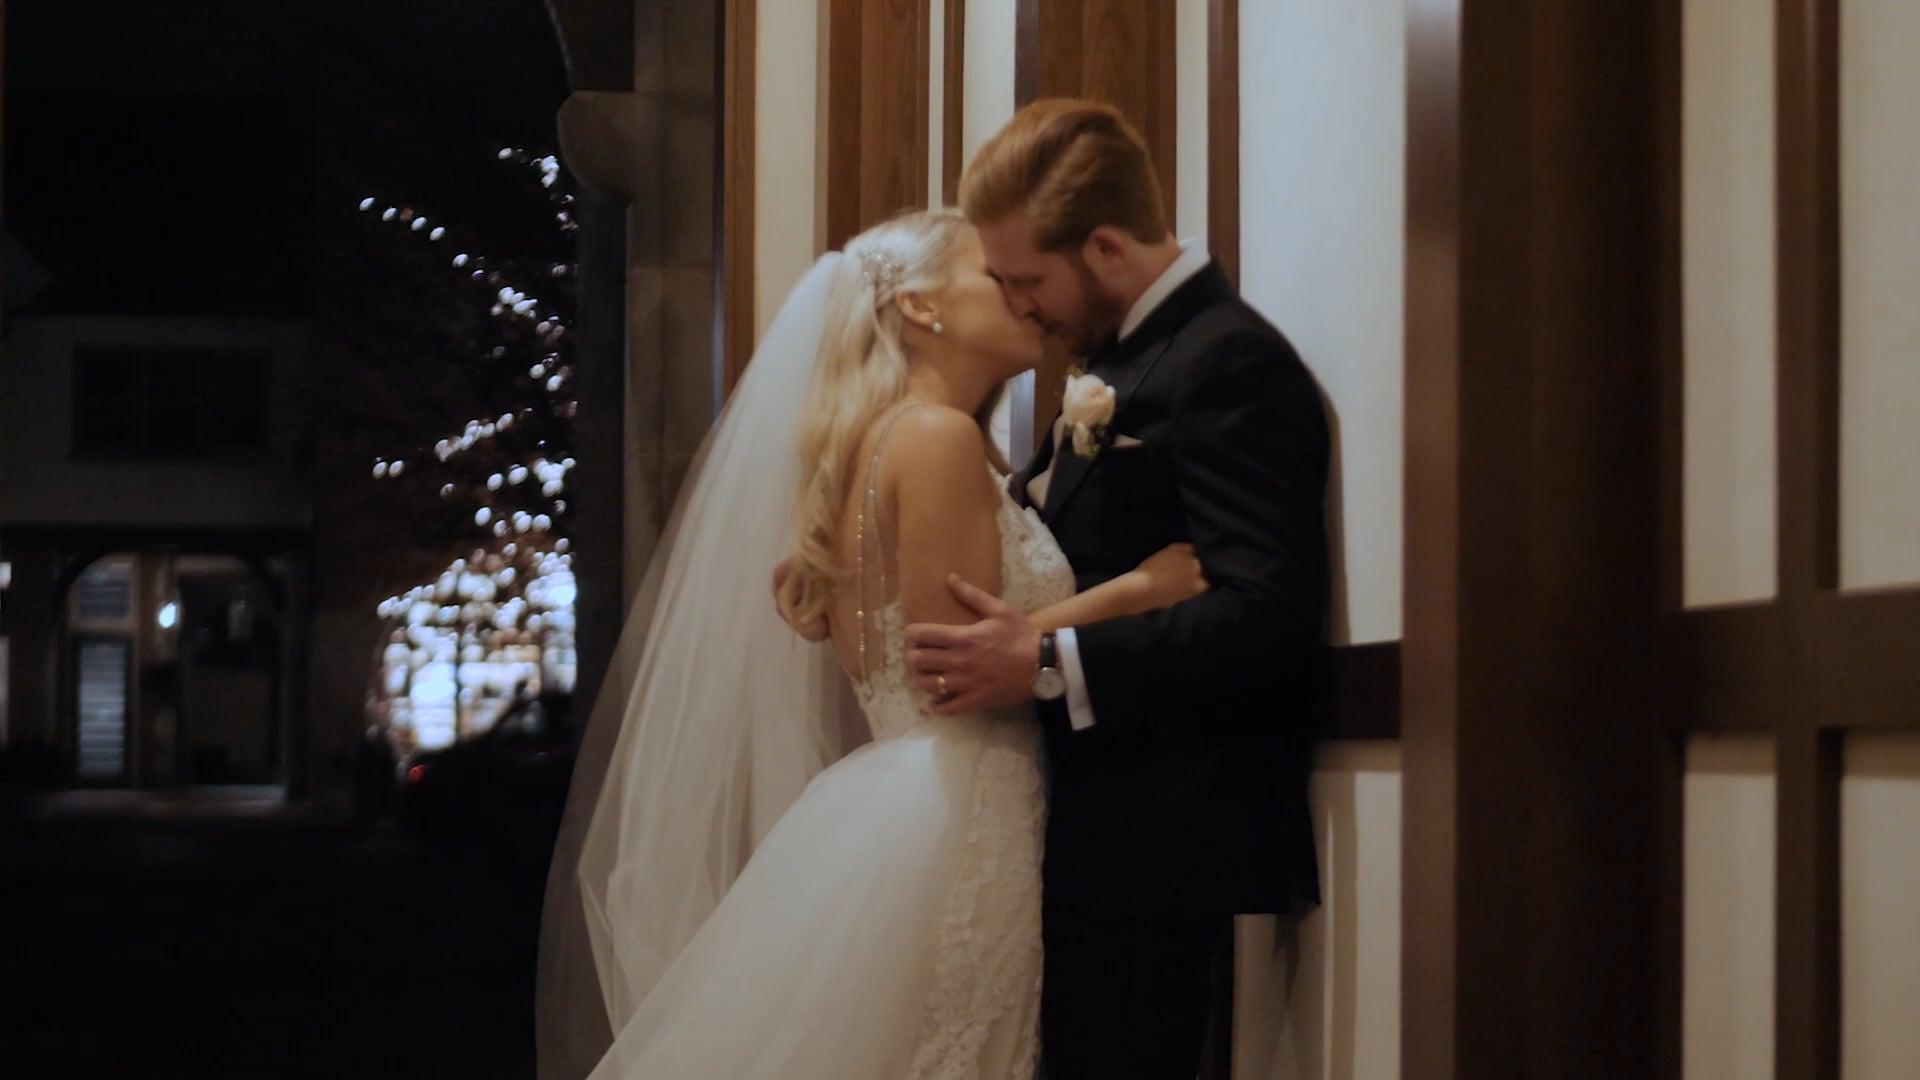 Jennifer + Dennis   Wedding Day Highlights   12-20-2019   Deer Path Inn, Lake Forest, IL